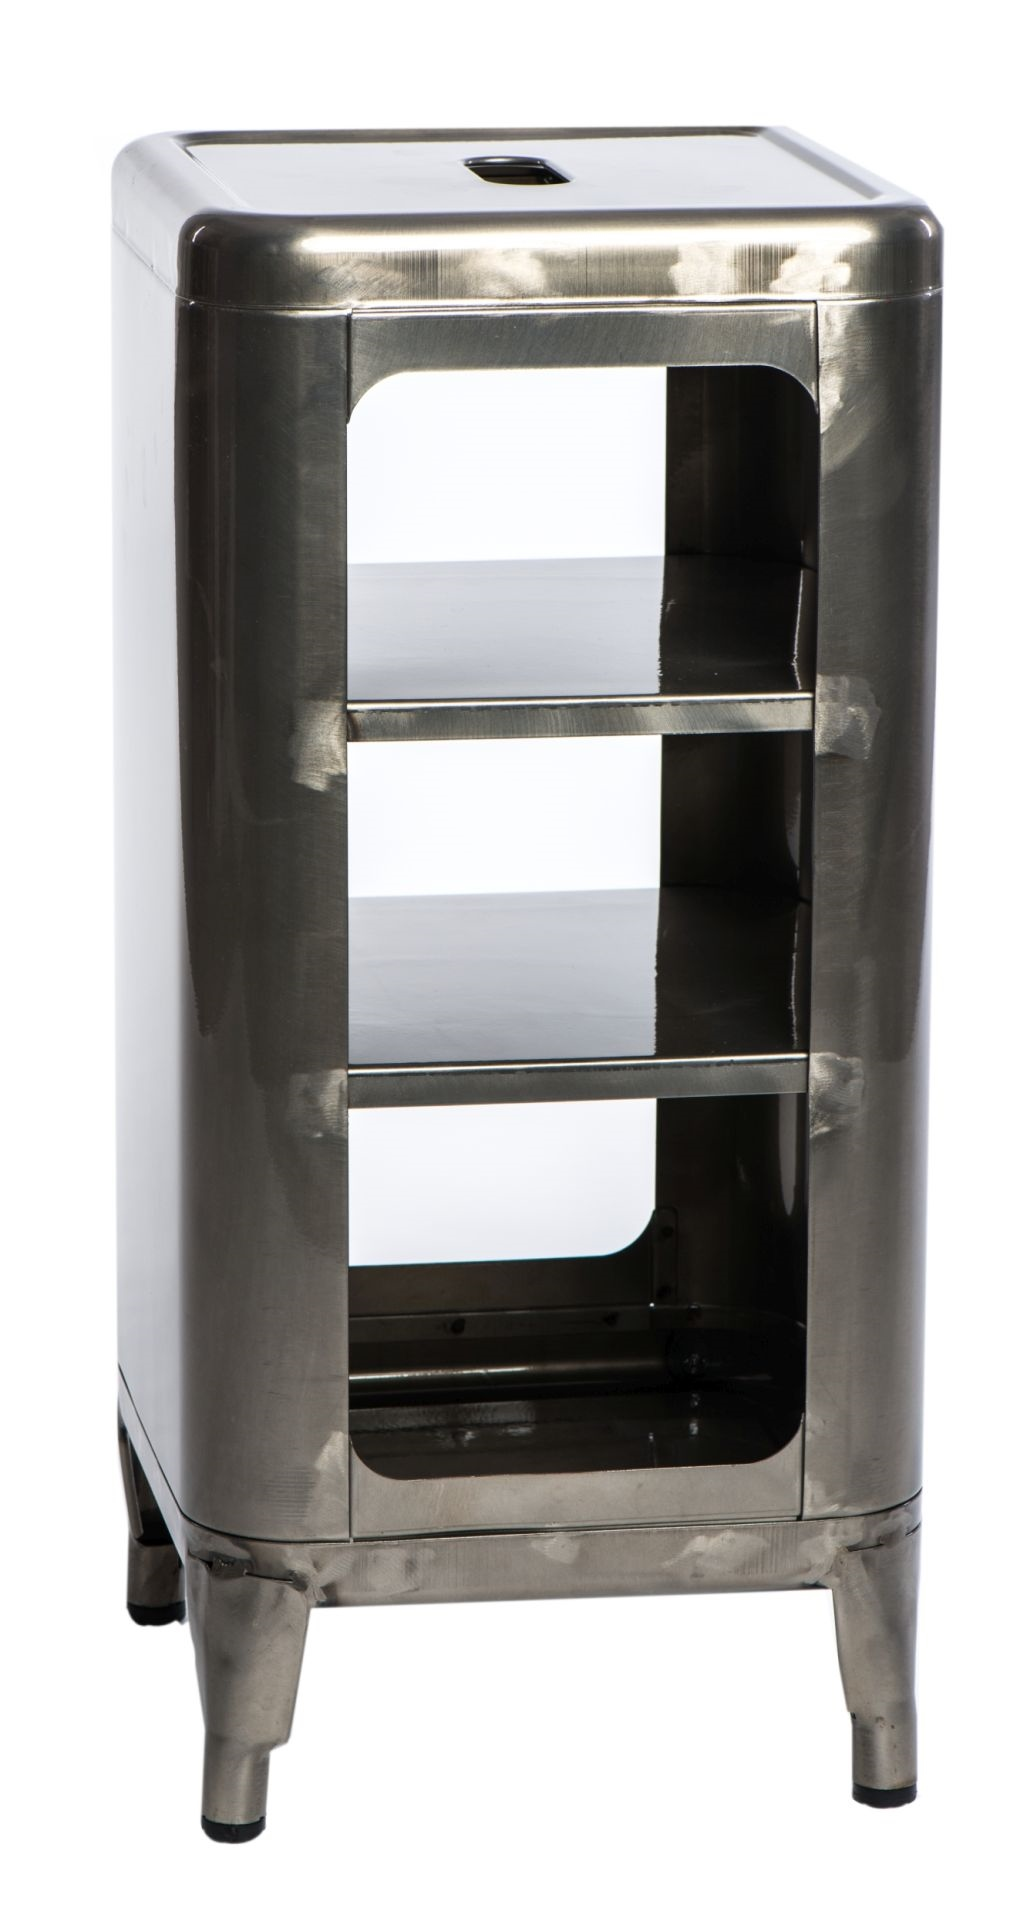 Regál / policová skříň Mason, 66 cm